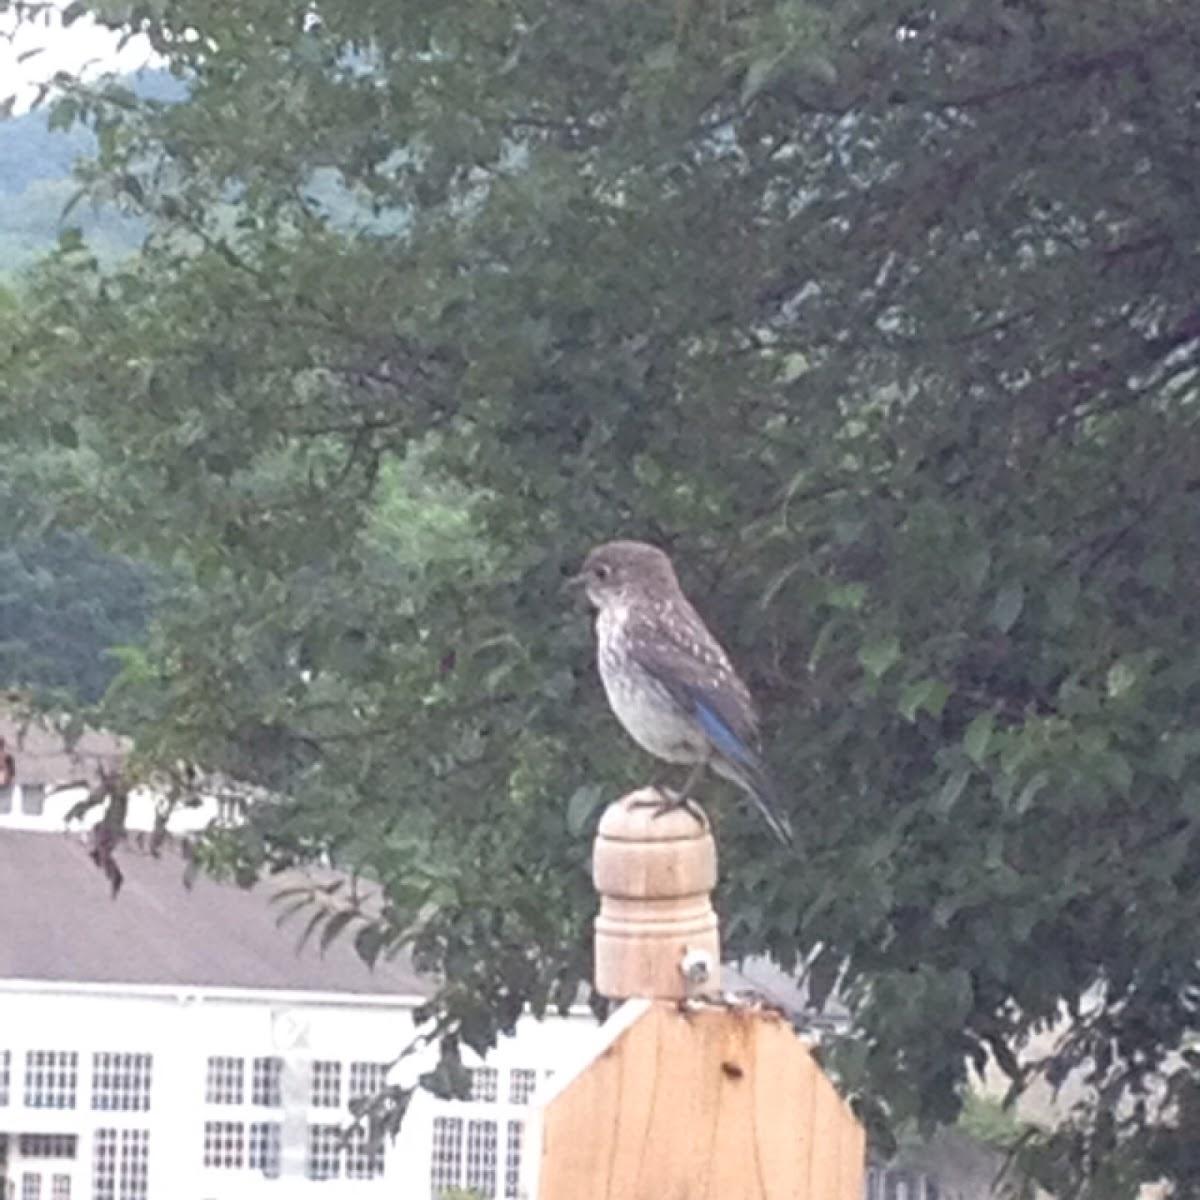 Eastern Bluebird - immature